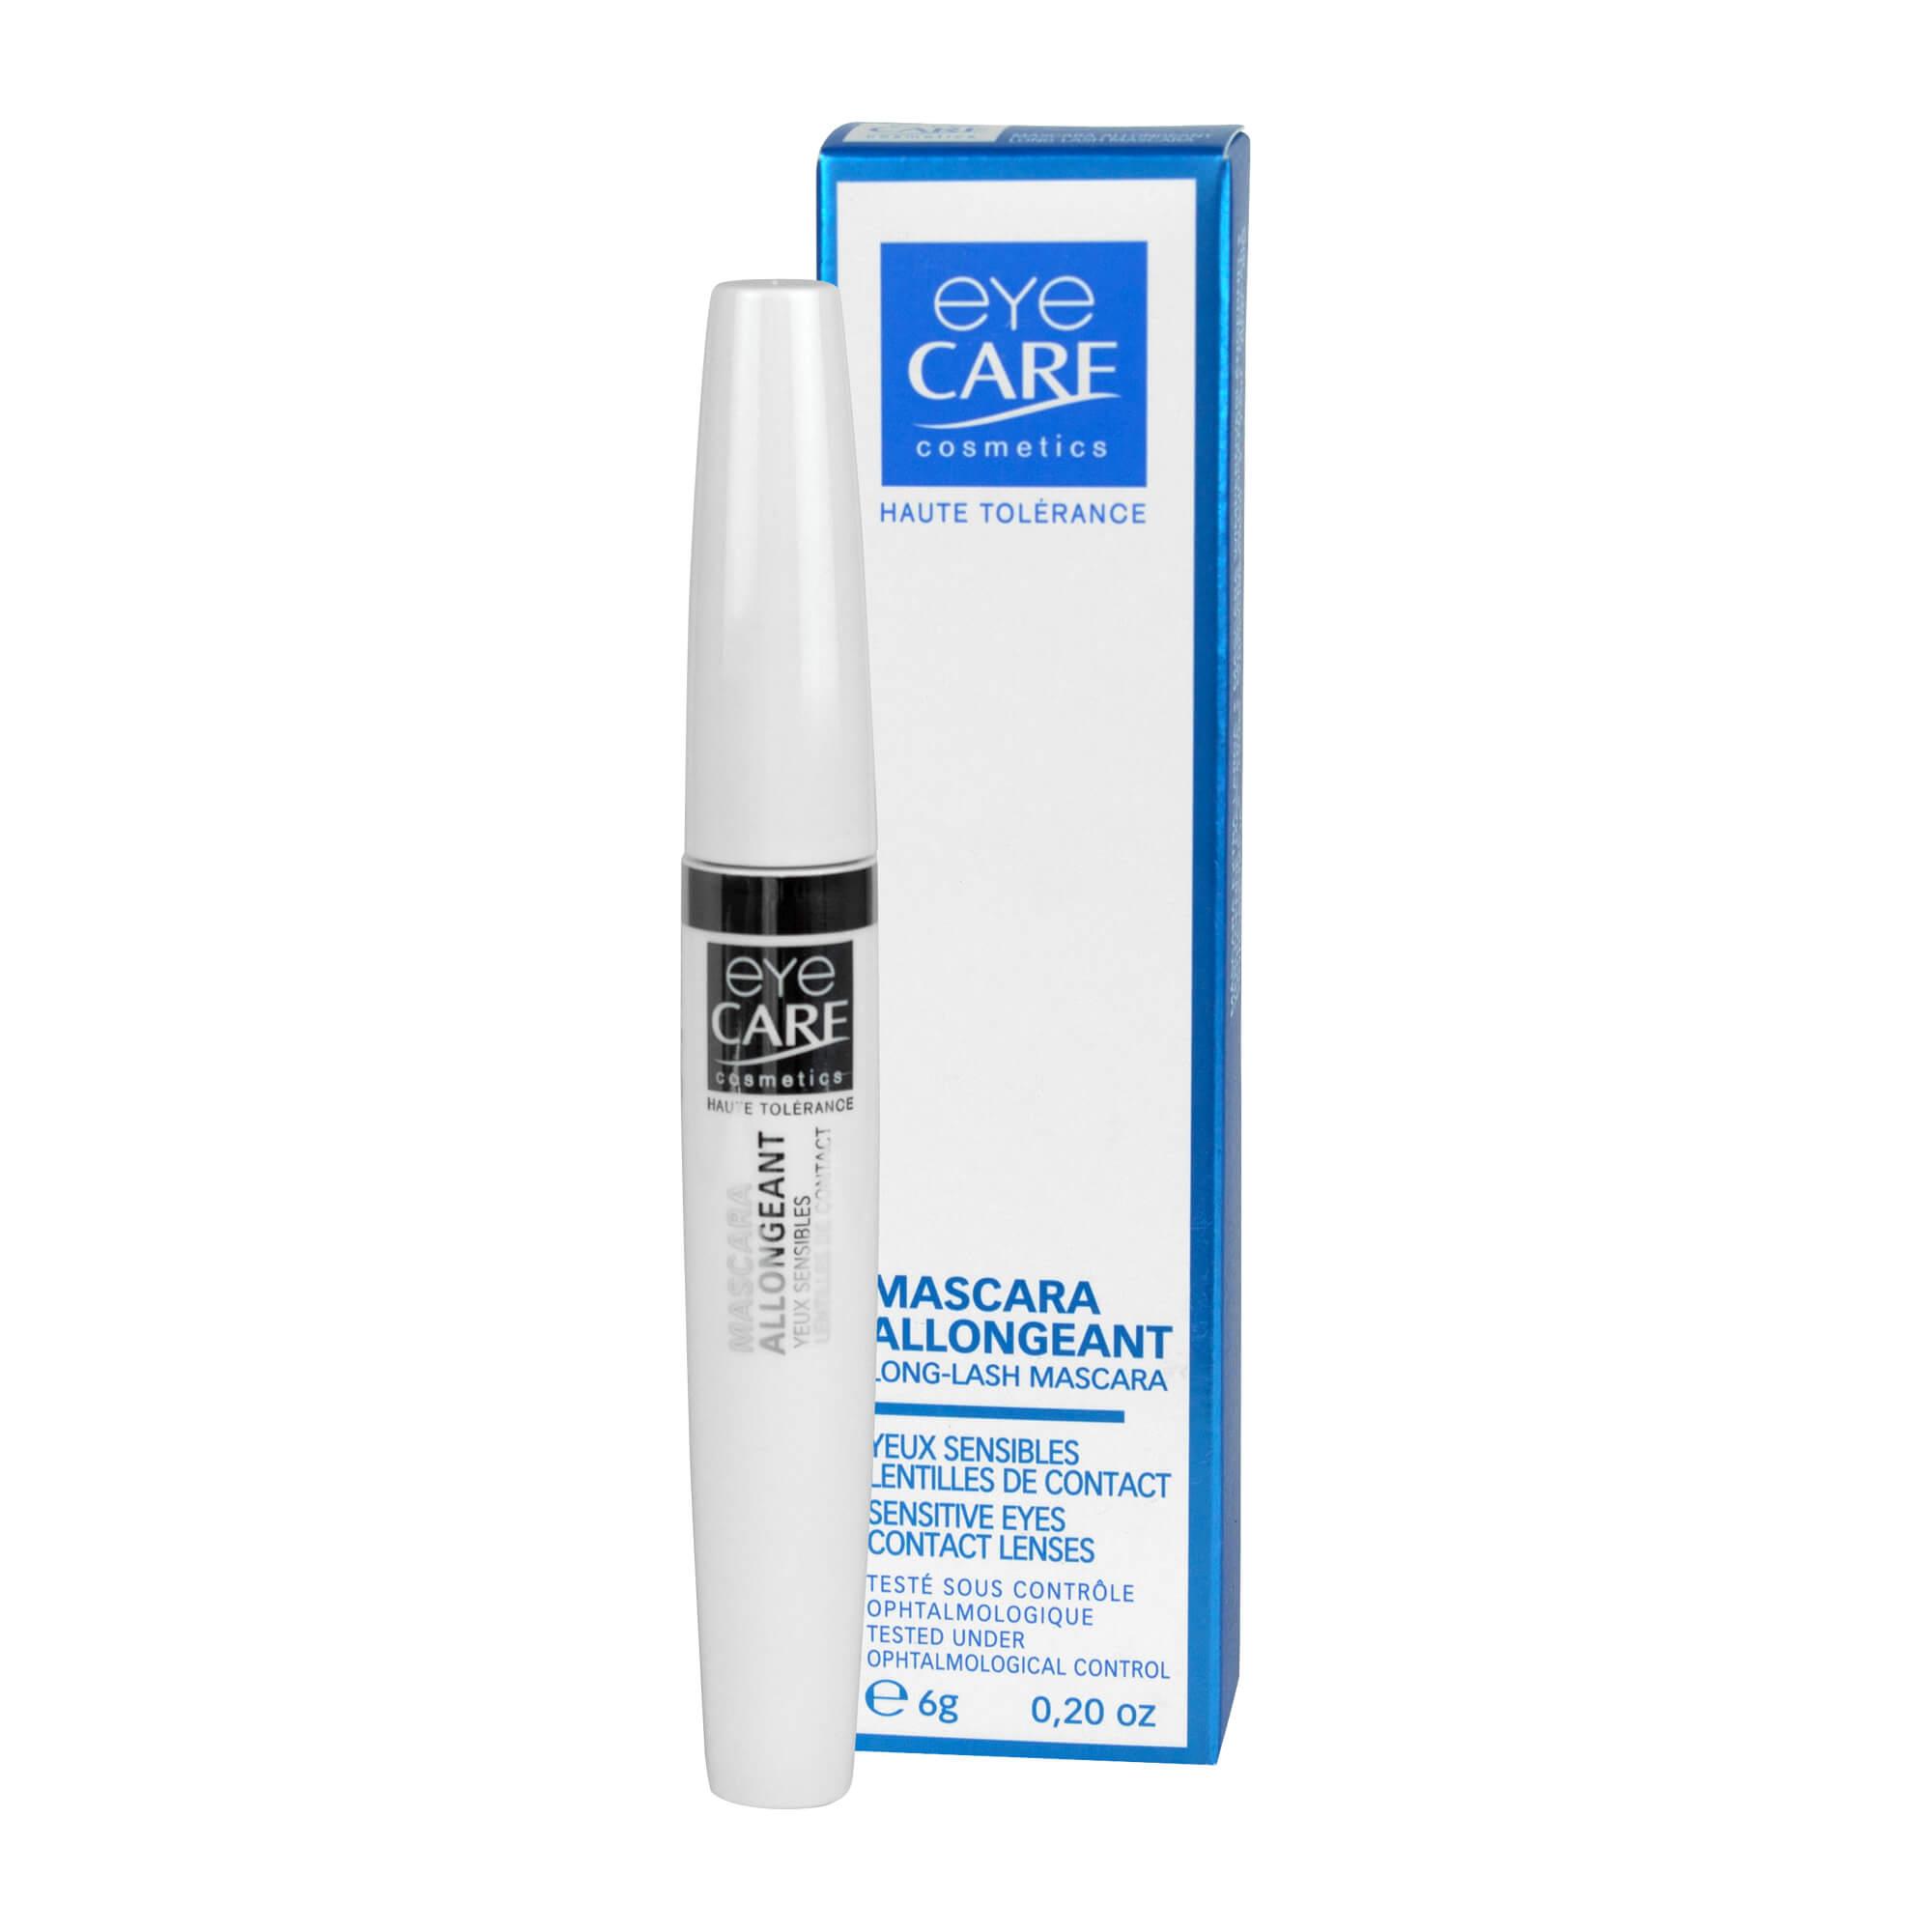 Eye Care Mascara wimpernverlängernd tiefschwarz